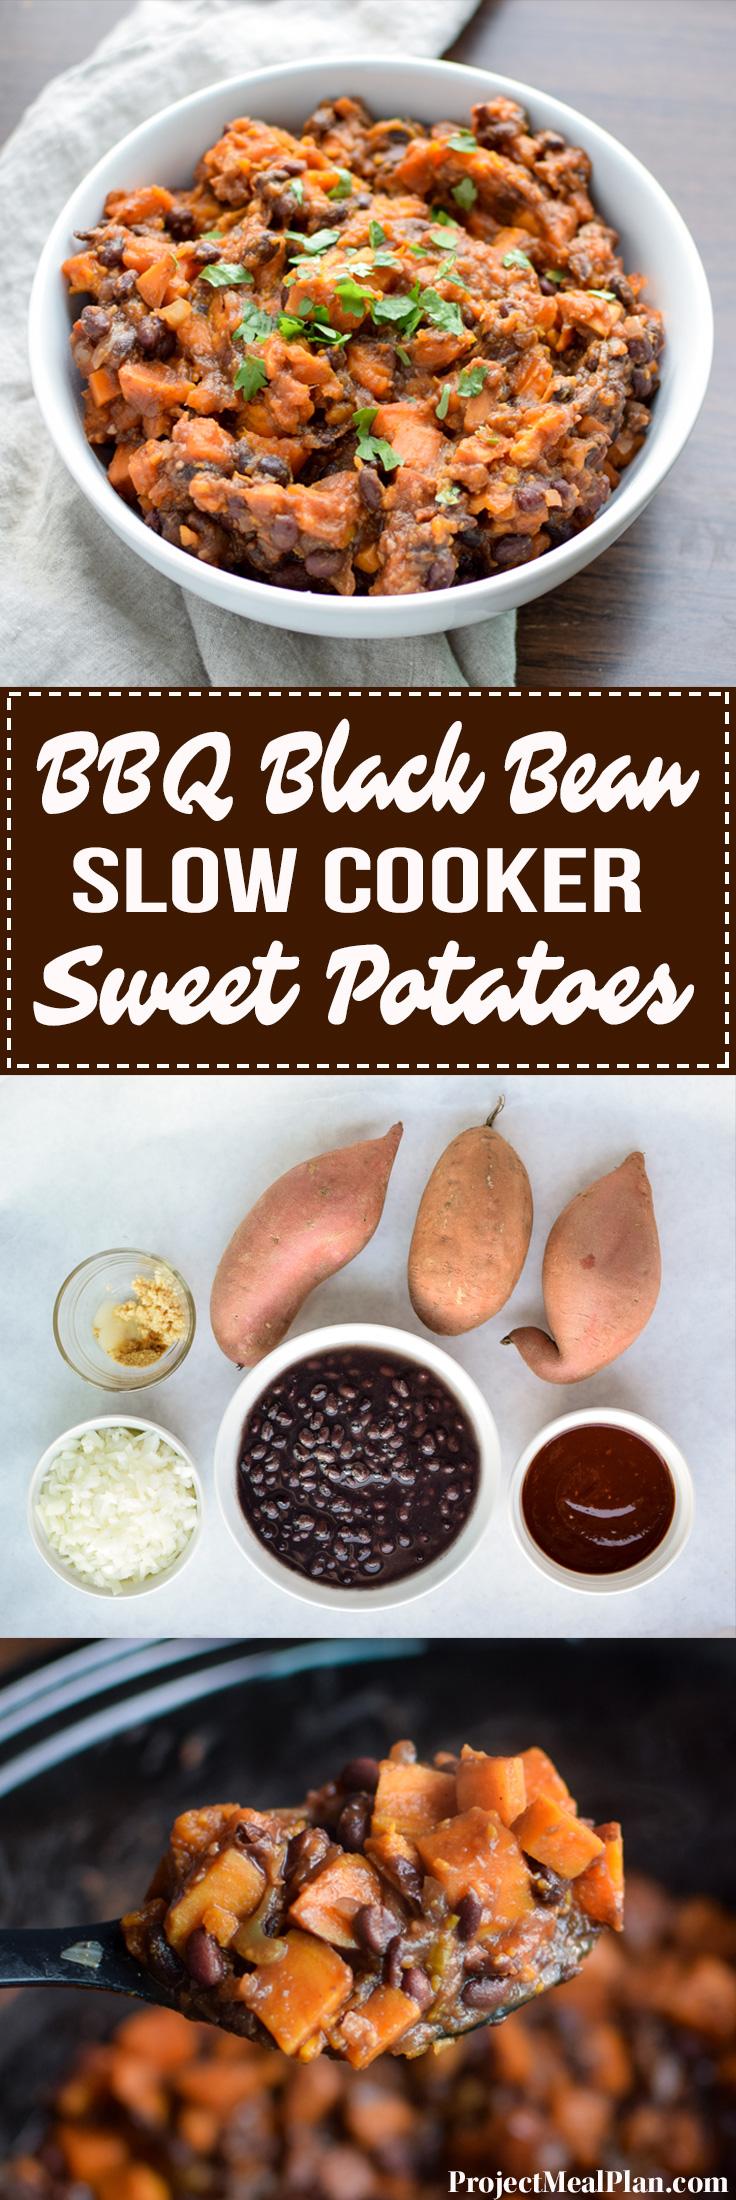 BBQ Black Bean Slow Cooker Sweet Potatoes - Black beans, sweet potatoes, and spicy BBQ sauce. A match made in side dish heaven! - ProjectMealPlan.com